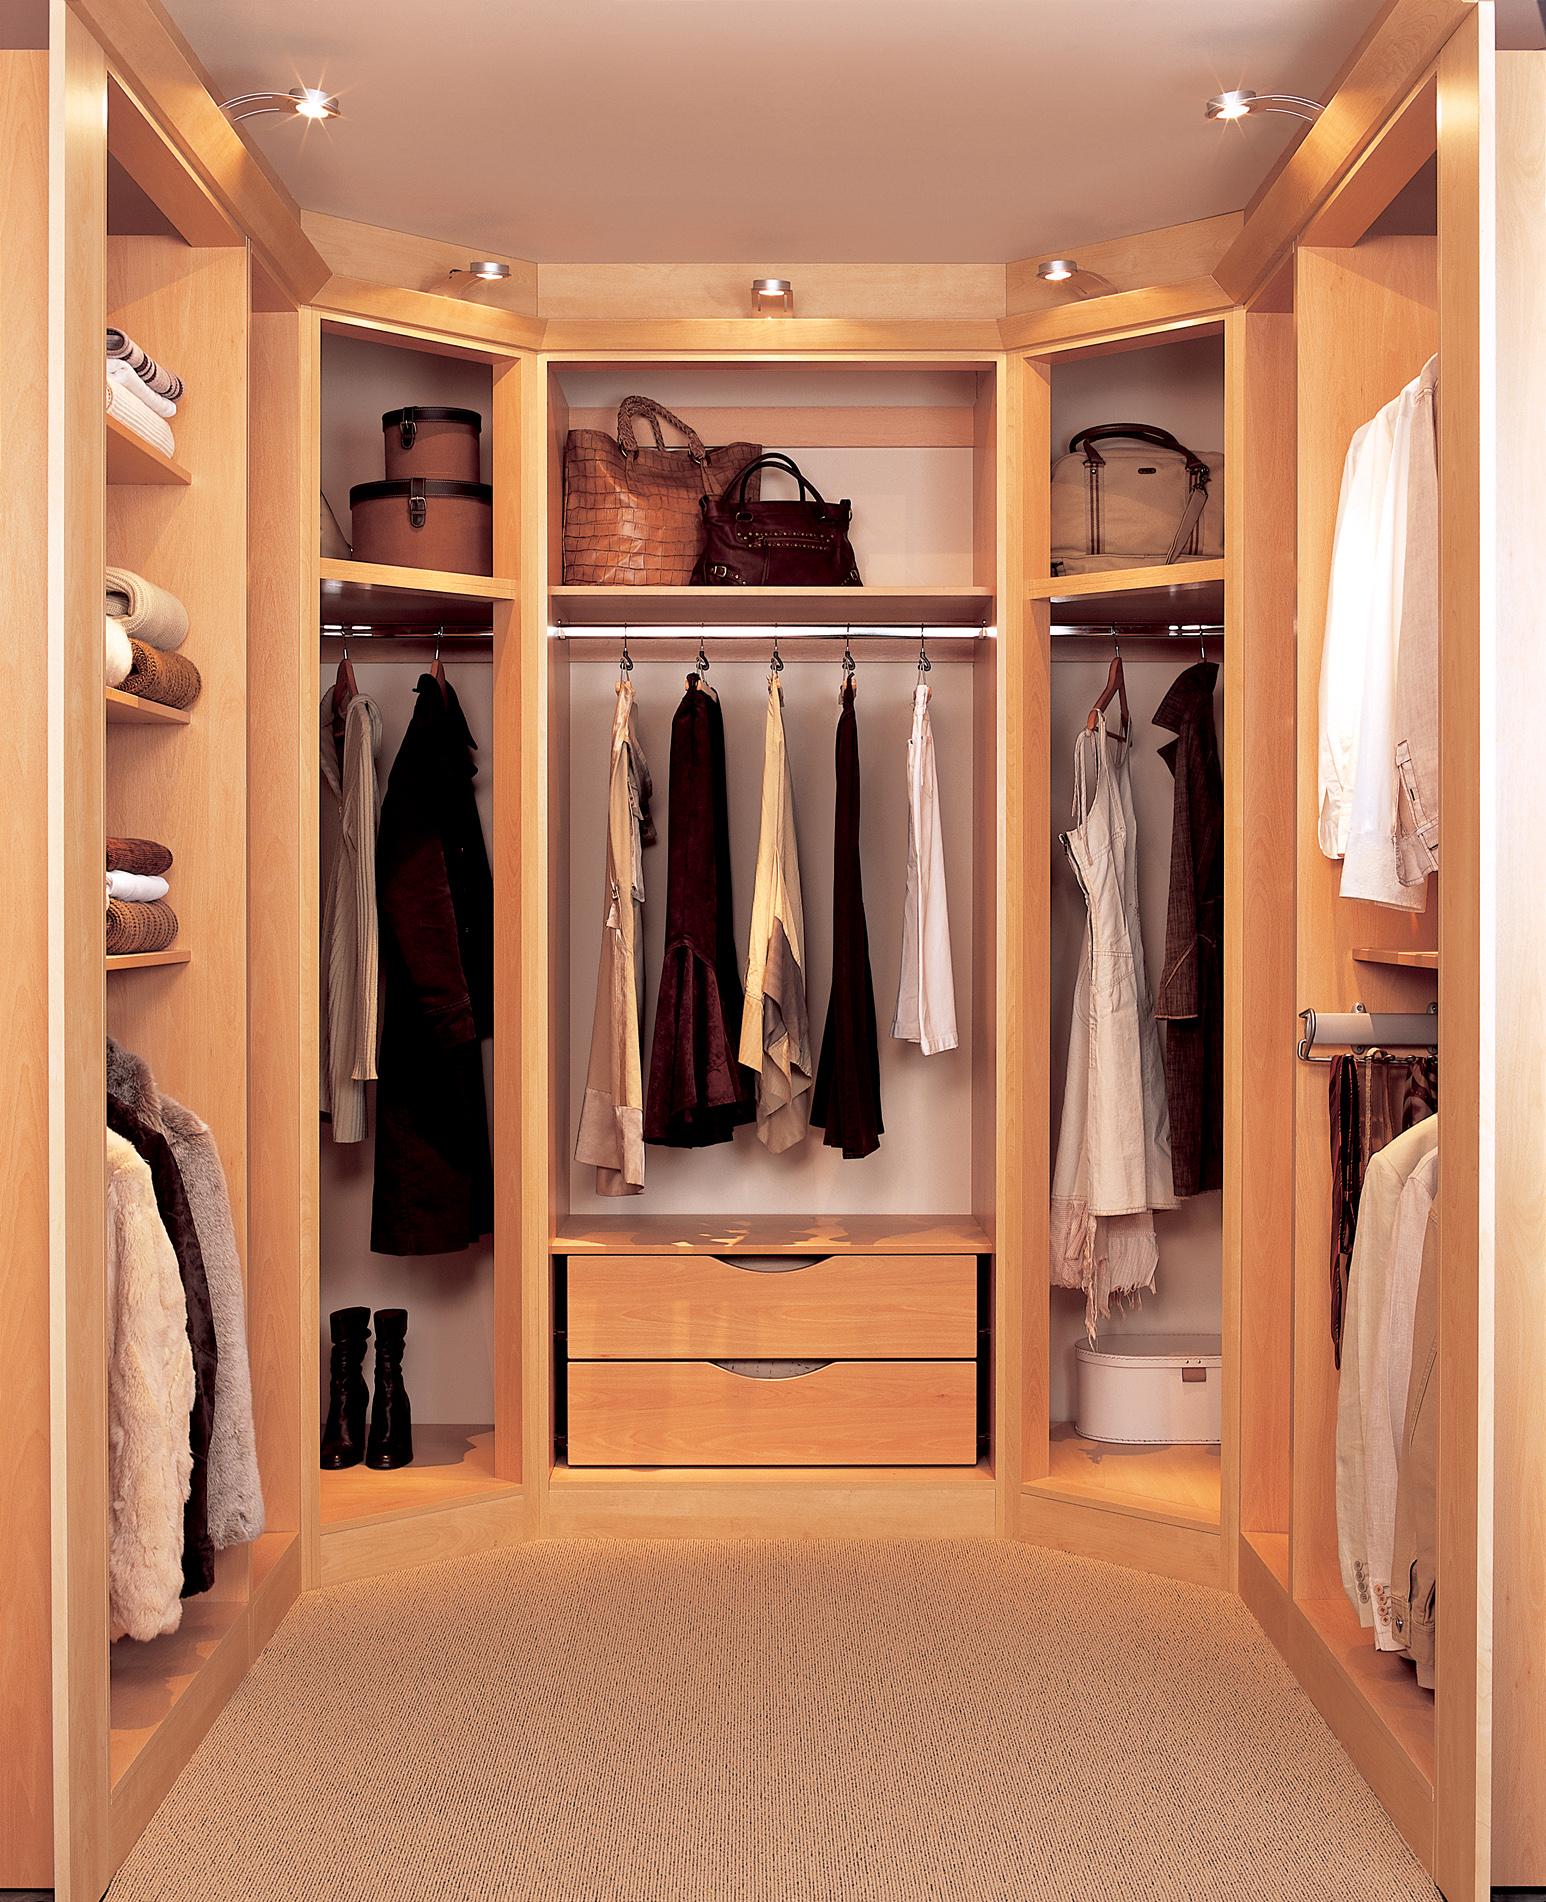 walk-in-closet-designs-plans-photo-15